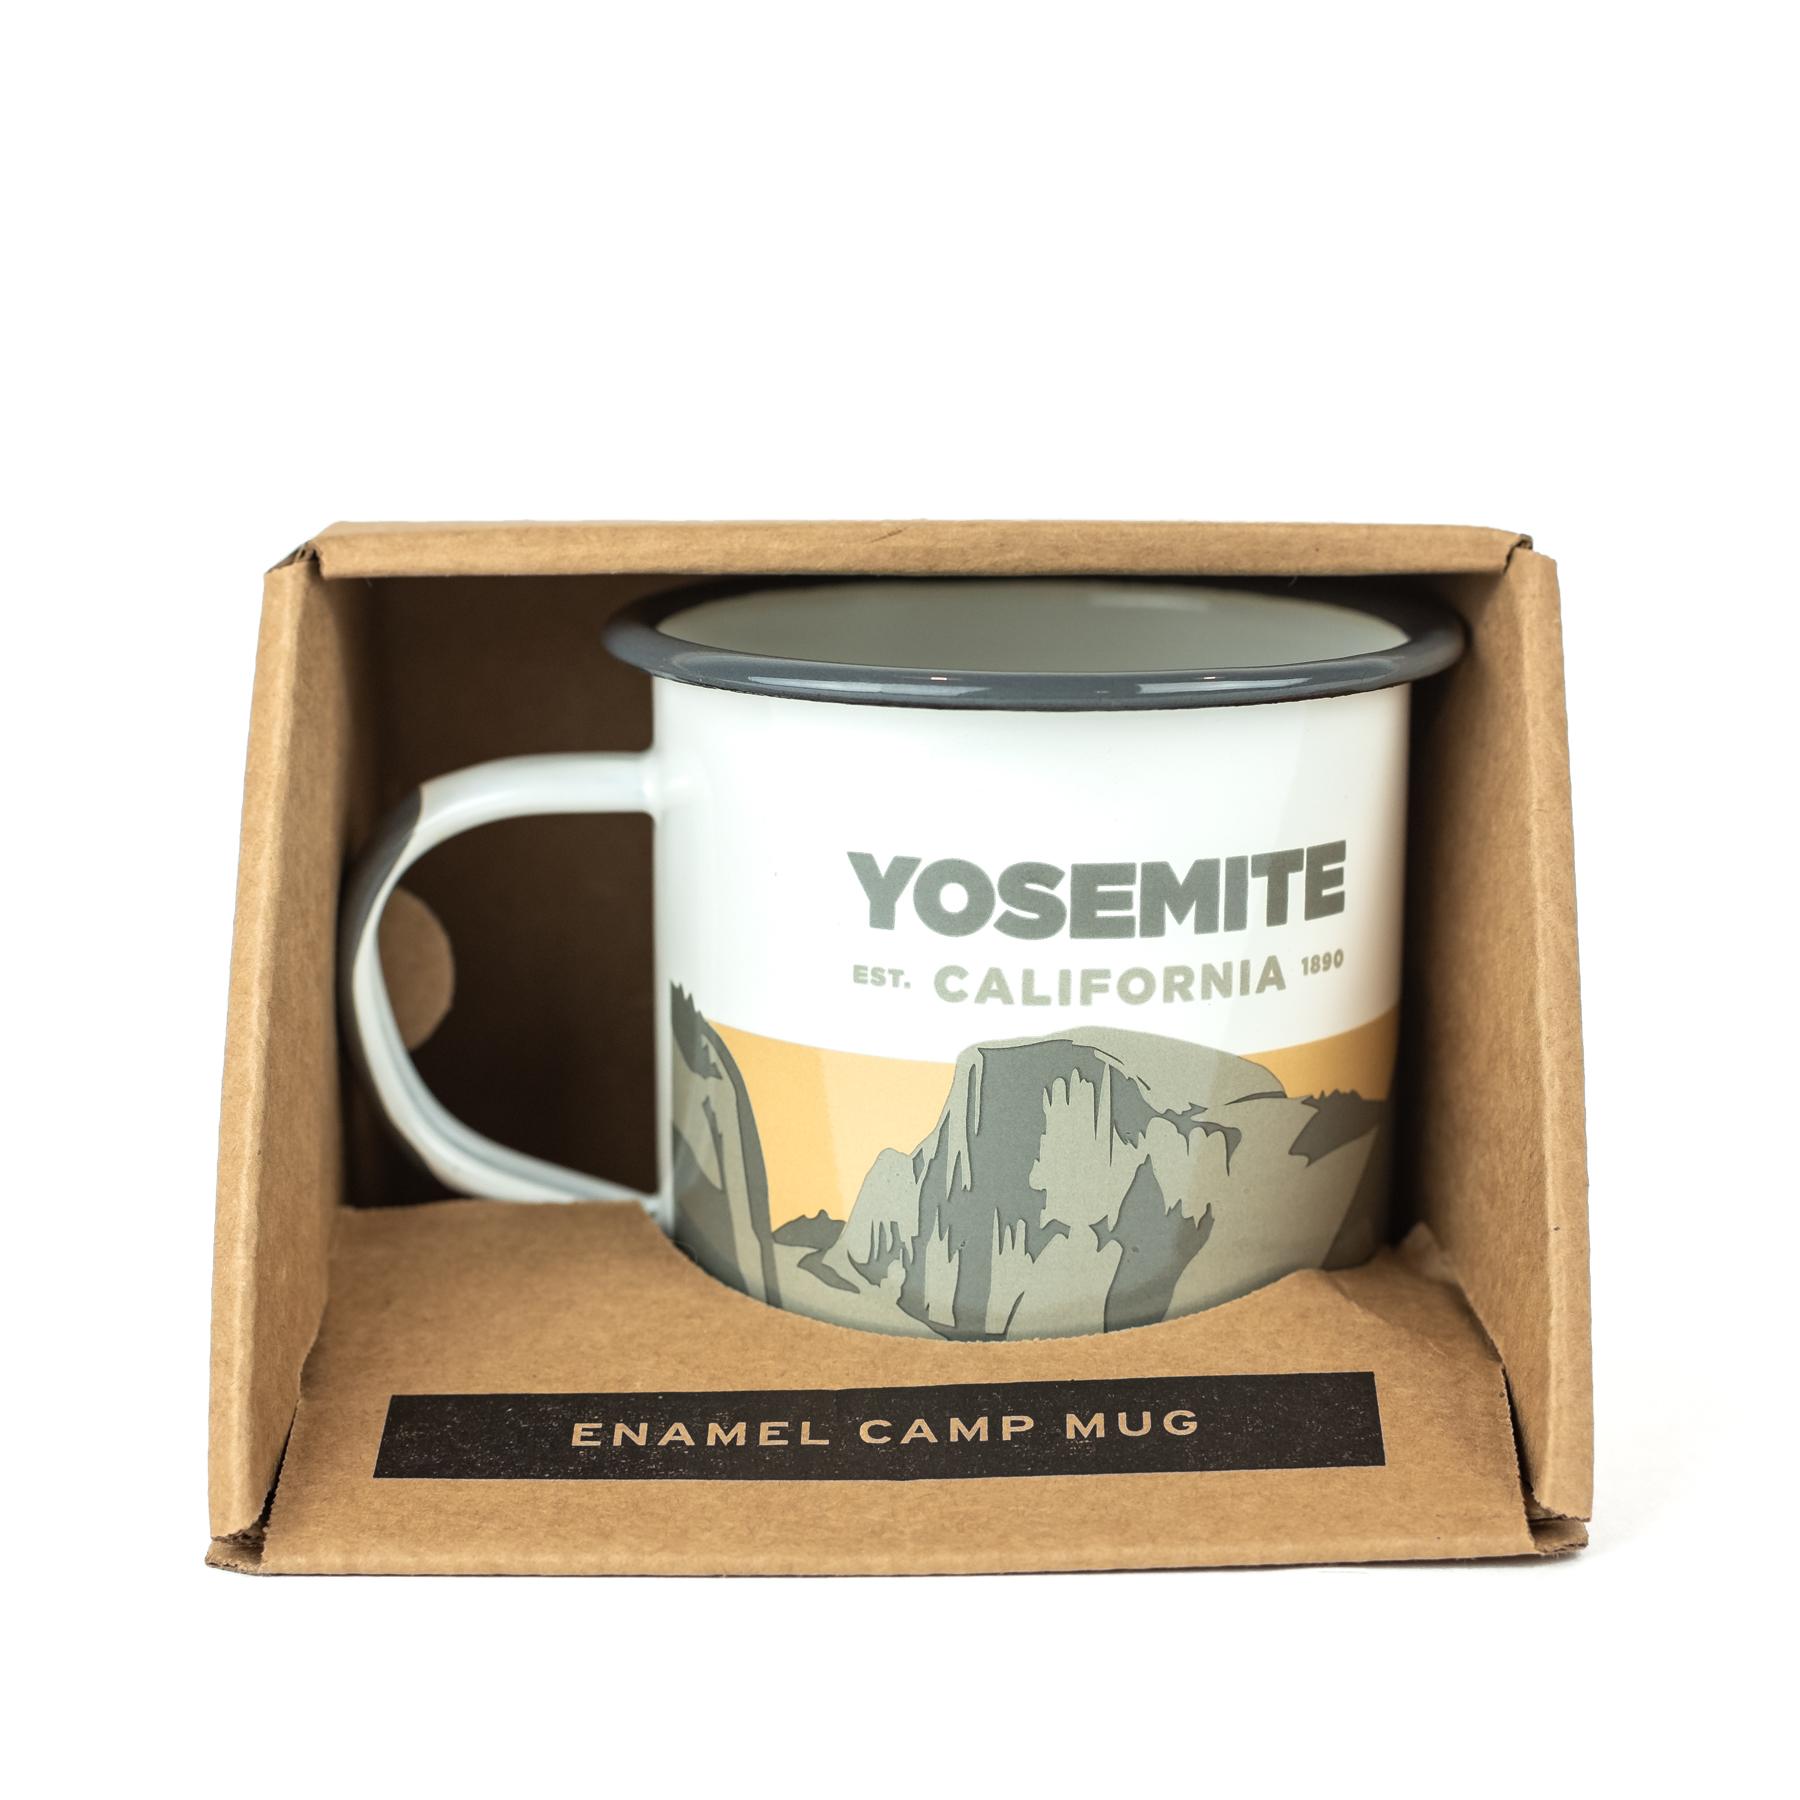 yosemite-enamel-mug-1.jpg